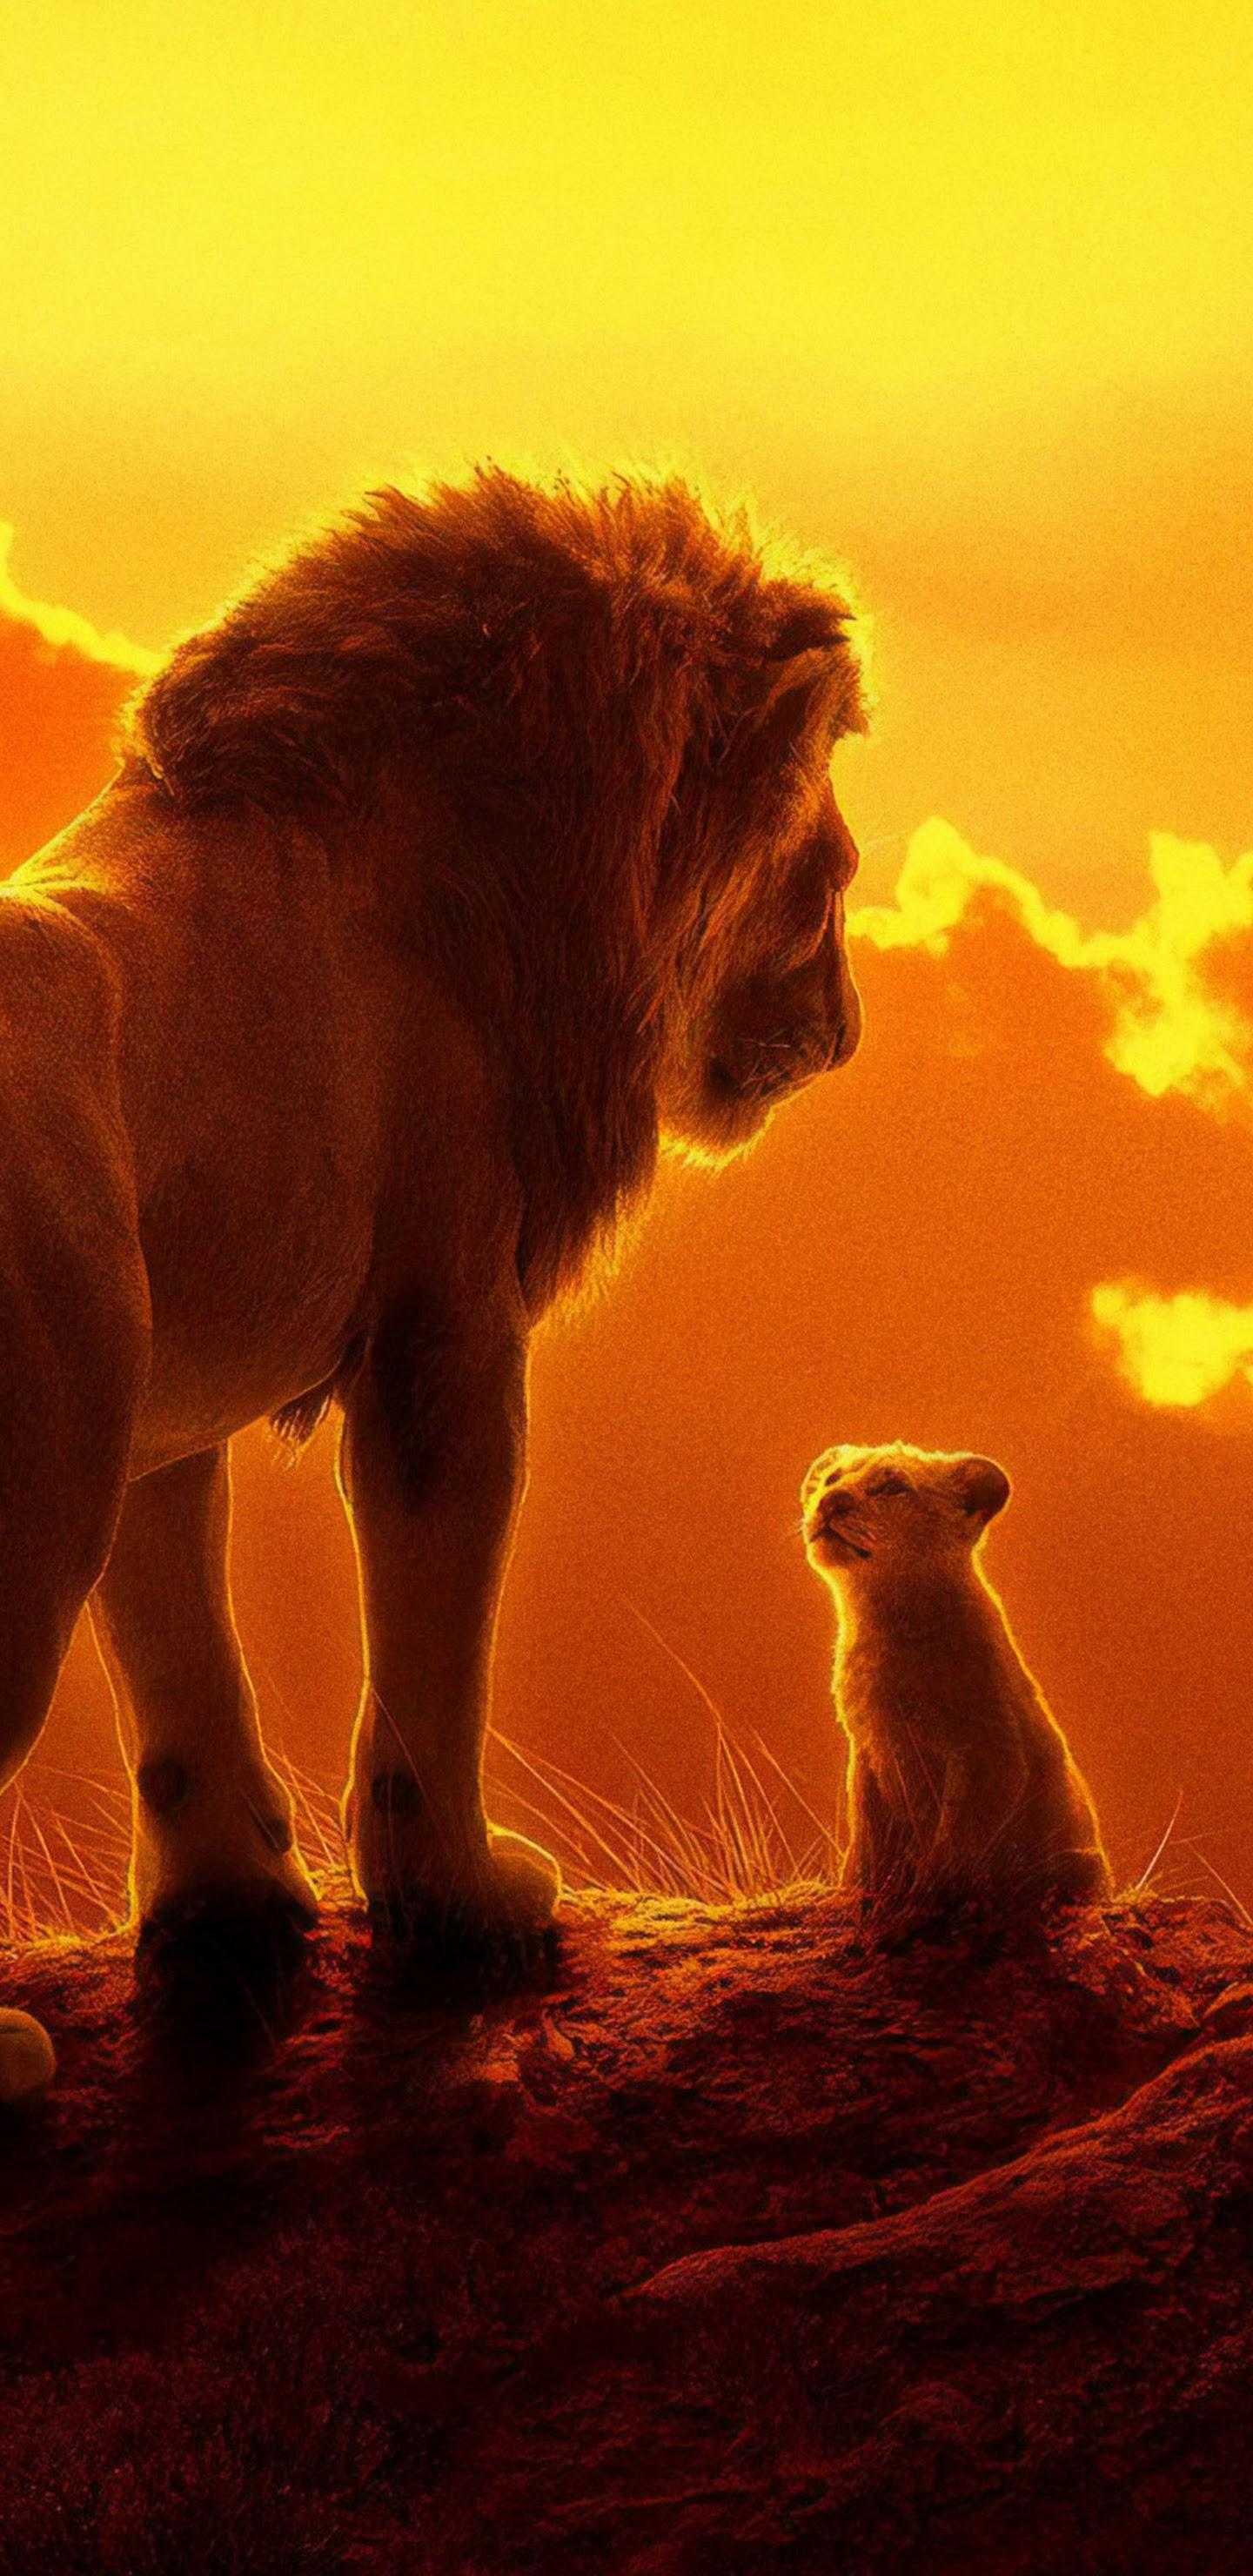 The Lion King 2019 Mufasa Simba 4k Wallpaper 20